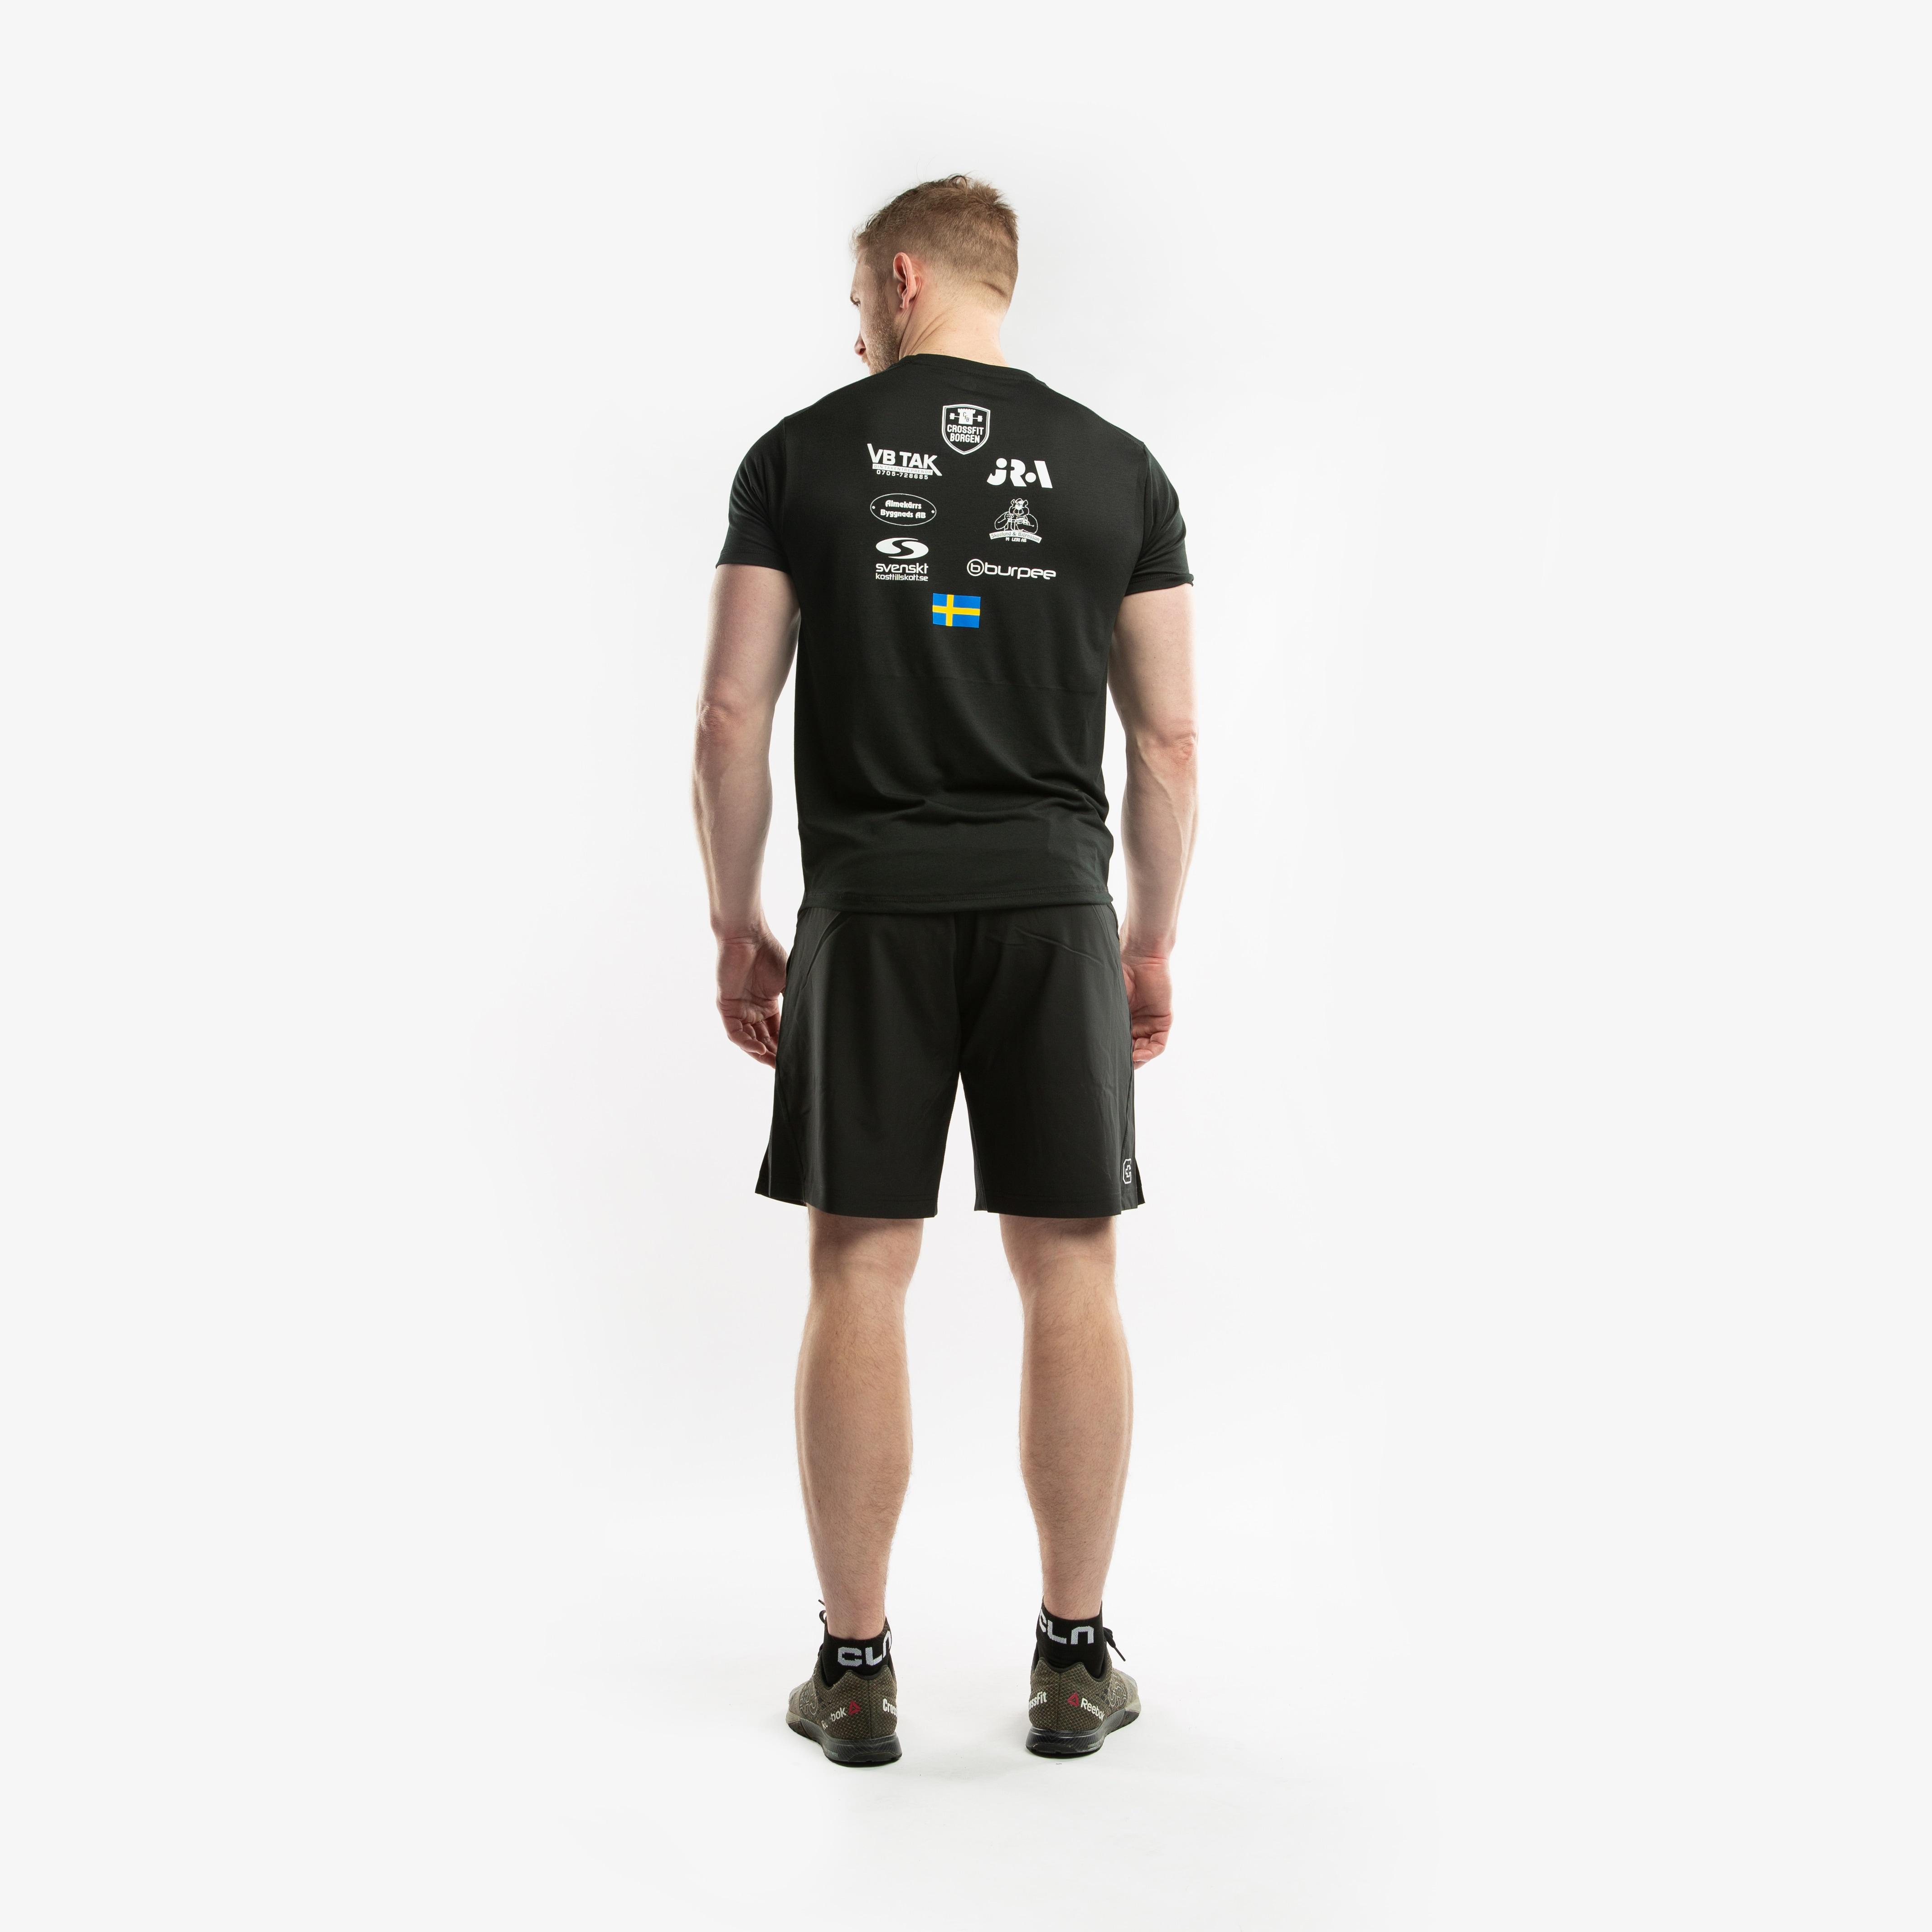 CLN Linus supporter t-shirt Black